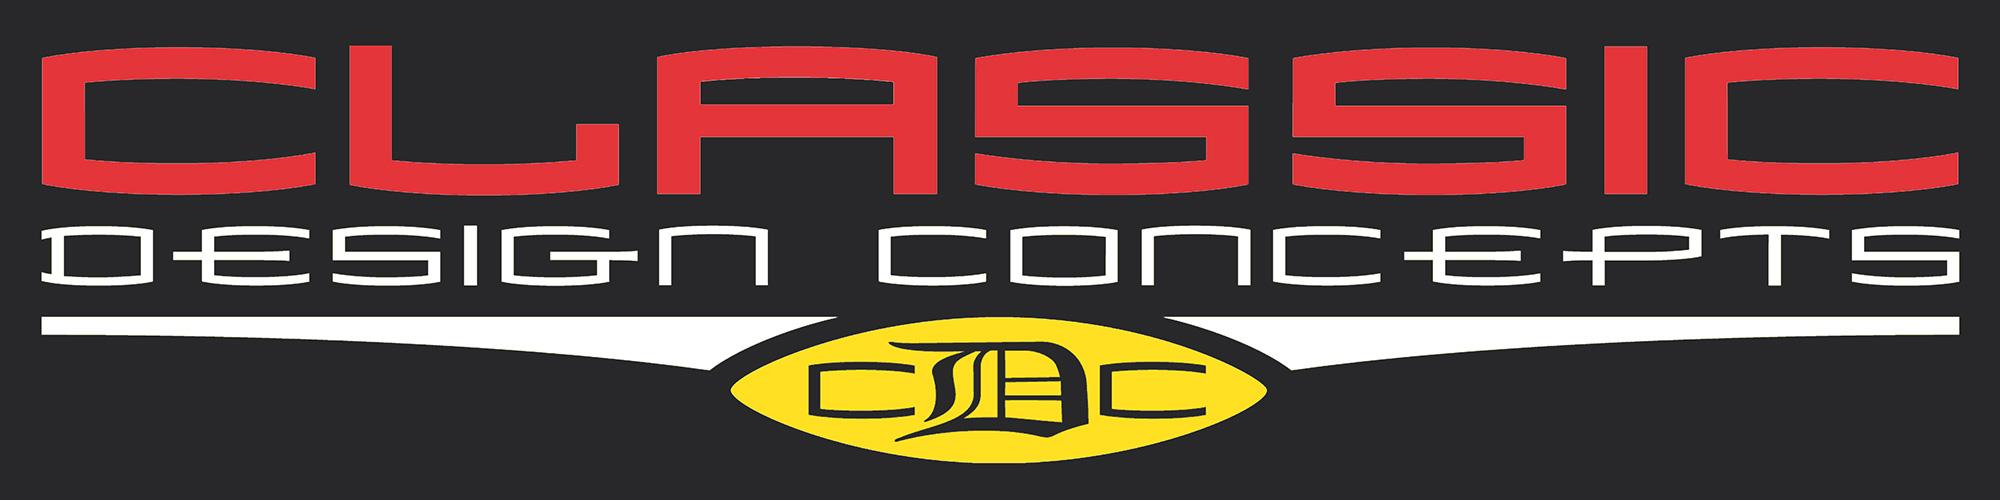 cdc-logo-2011-nsmc-.jpg